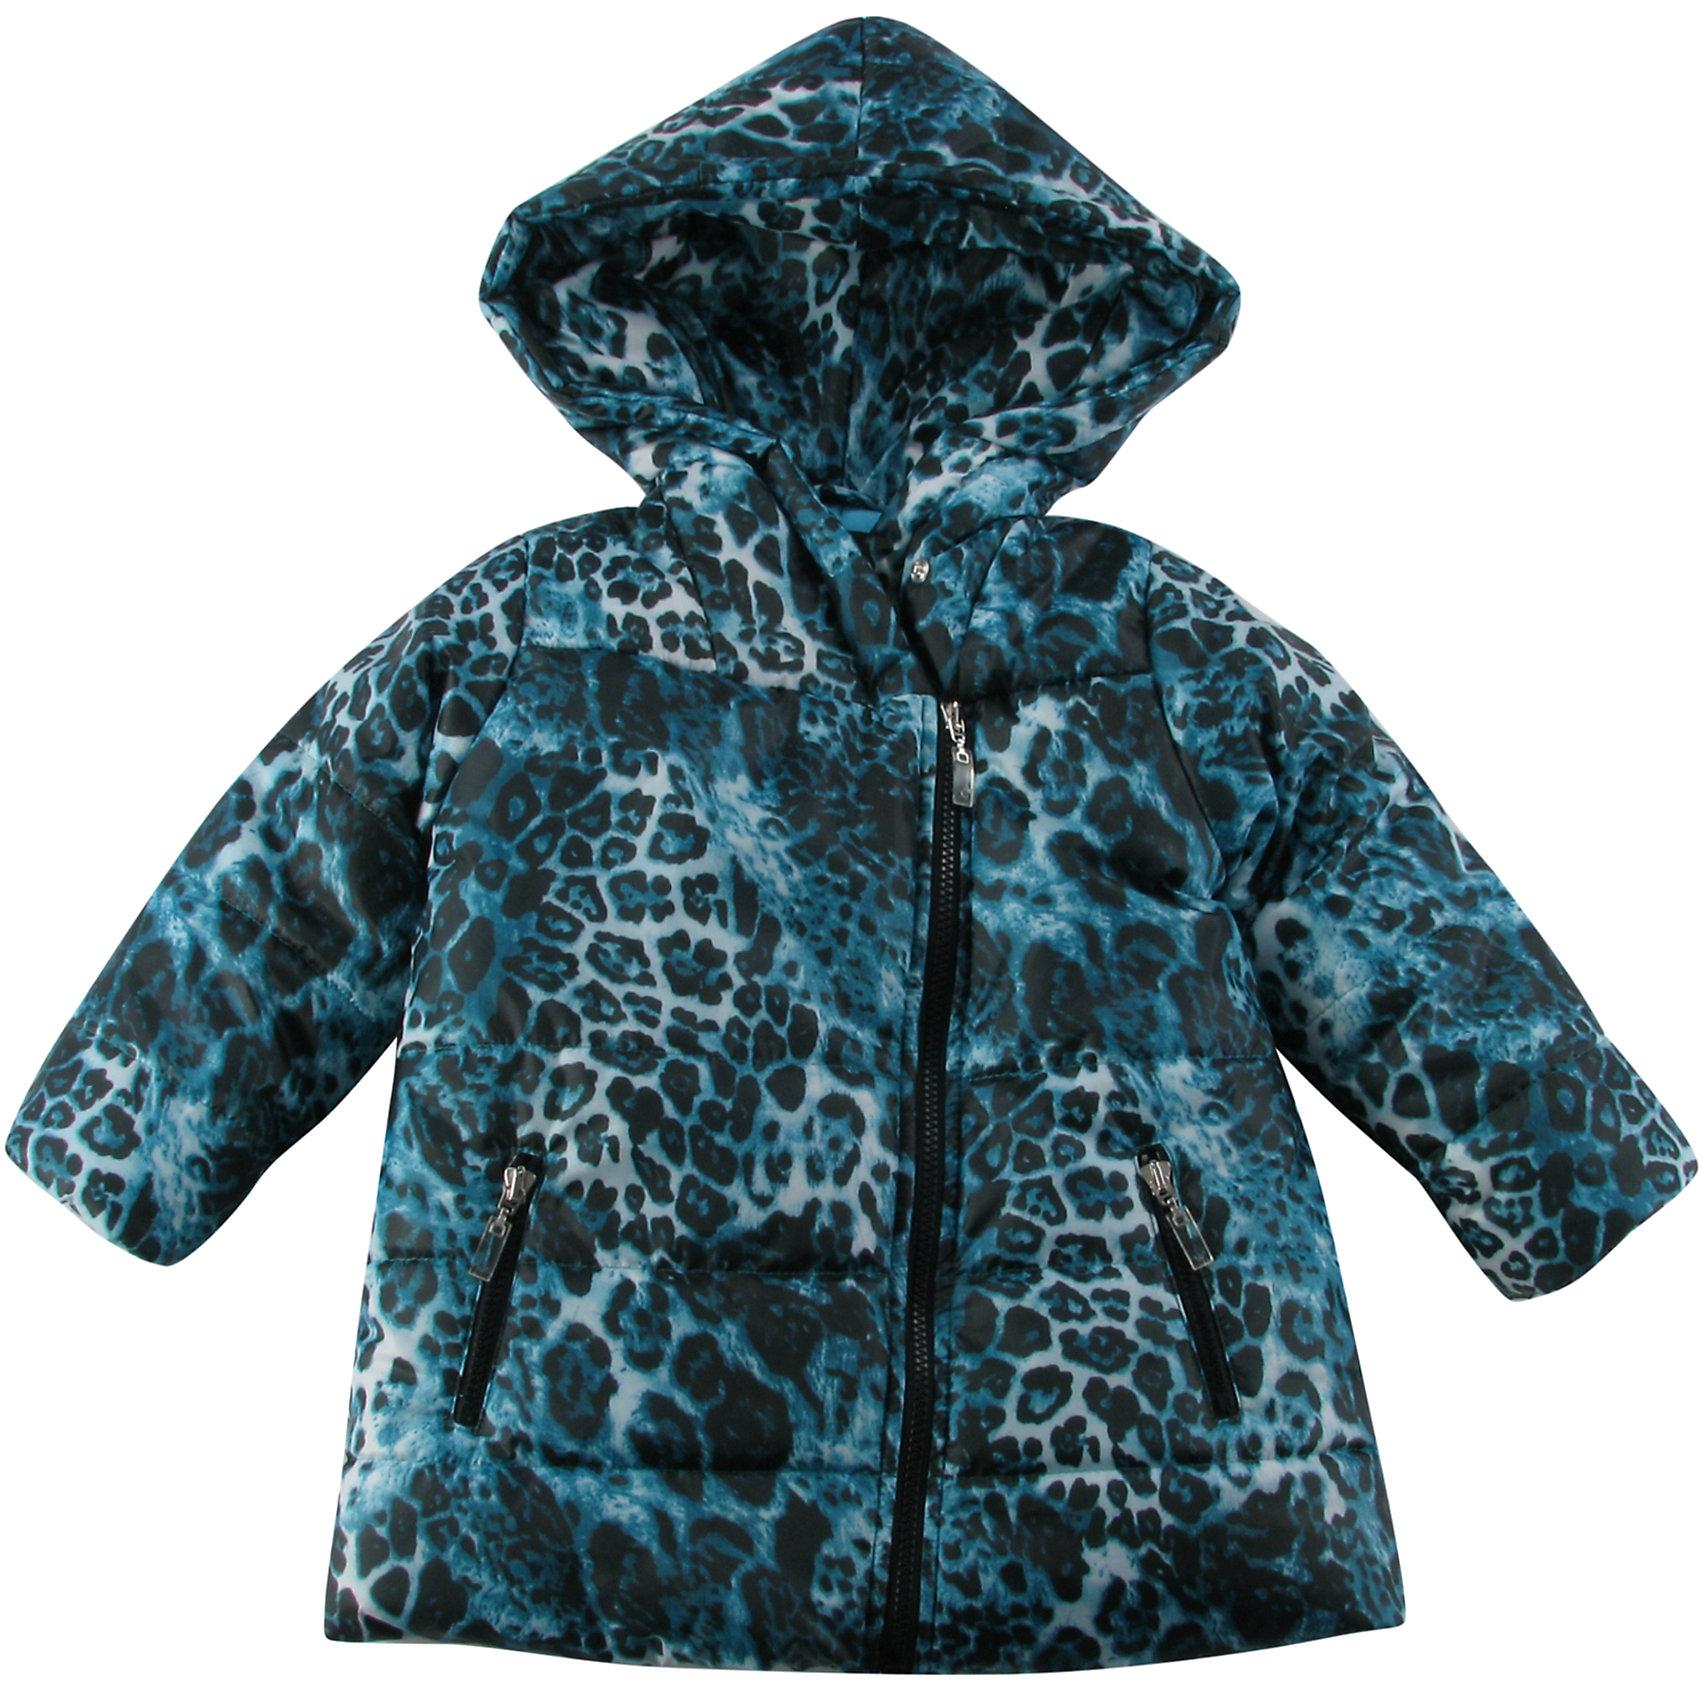 Куртка утепленная для девочки WojcikВерхняя одежда<br>Куртка утепленная для девочки Wojcik<br>Состав:<br>Полиэстер 100%<br><br>Ширина мм: 356<br>Глубина мм: 10<br>Высота мм: 245<br>Вес г: 519<br>Цвет: белый<br>Возраст от месяцев: 84<br>Возраст до месяцев: 96<br>Пол: Женский<br>Возраст: Детский<br>Размер: 128,134,92,98,104,110,116,122<br>SKU: 5591341